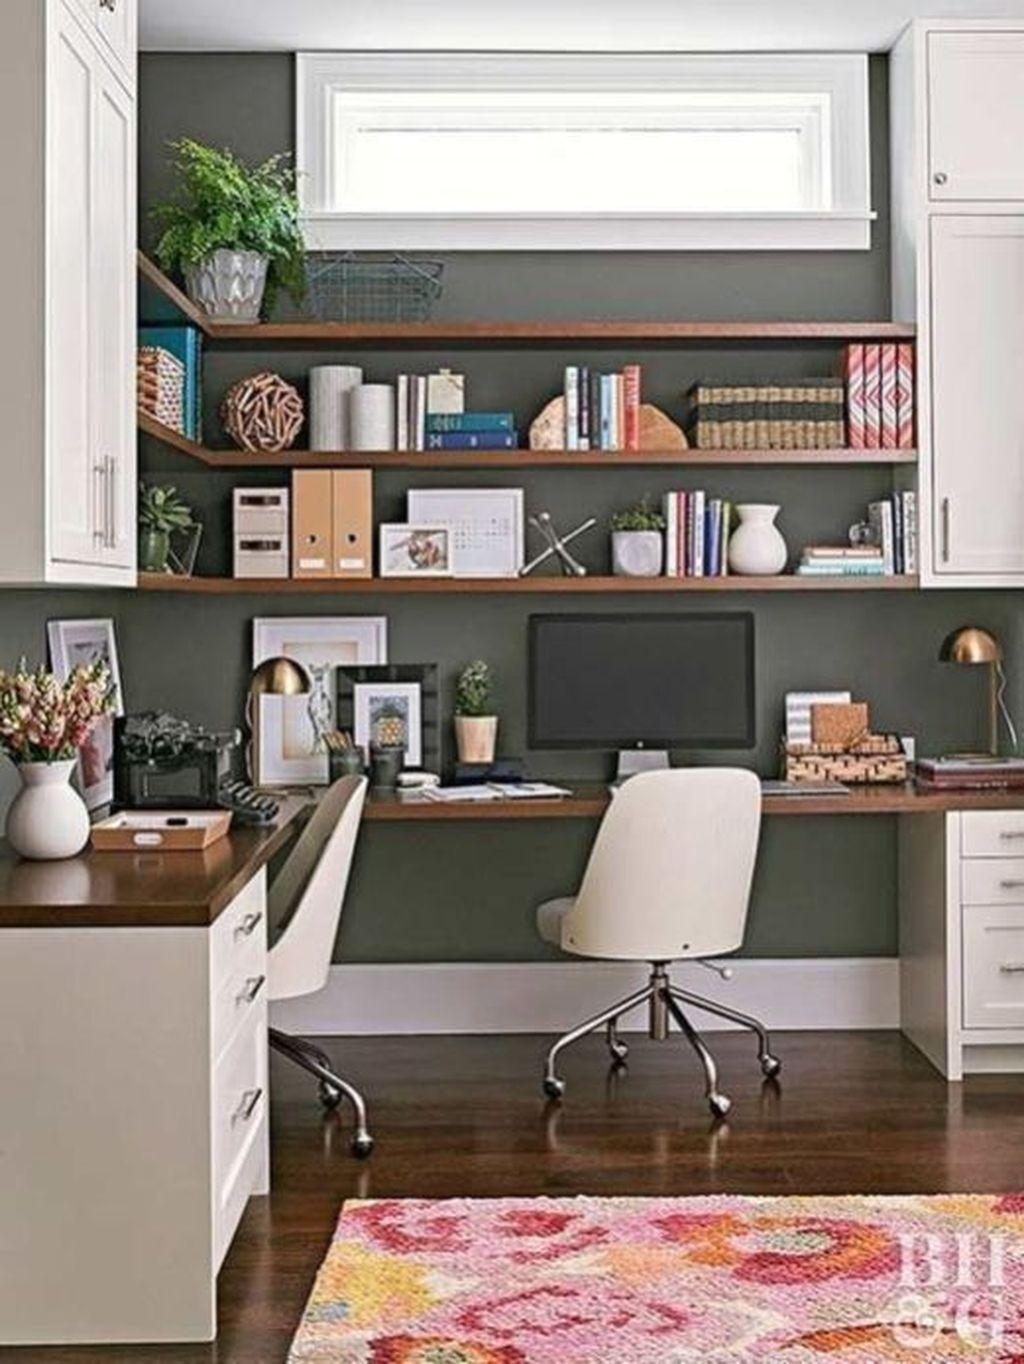 Inspiring Double Desk Home Office Design Ideas 05